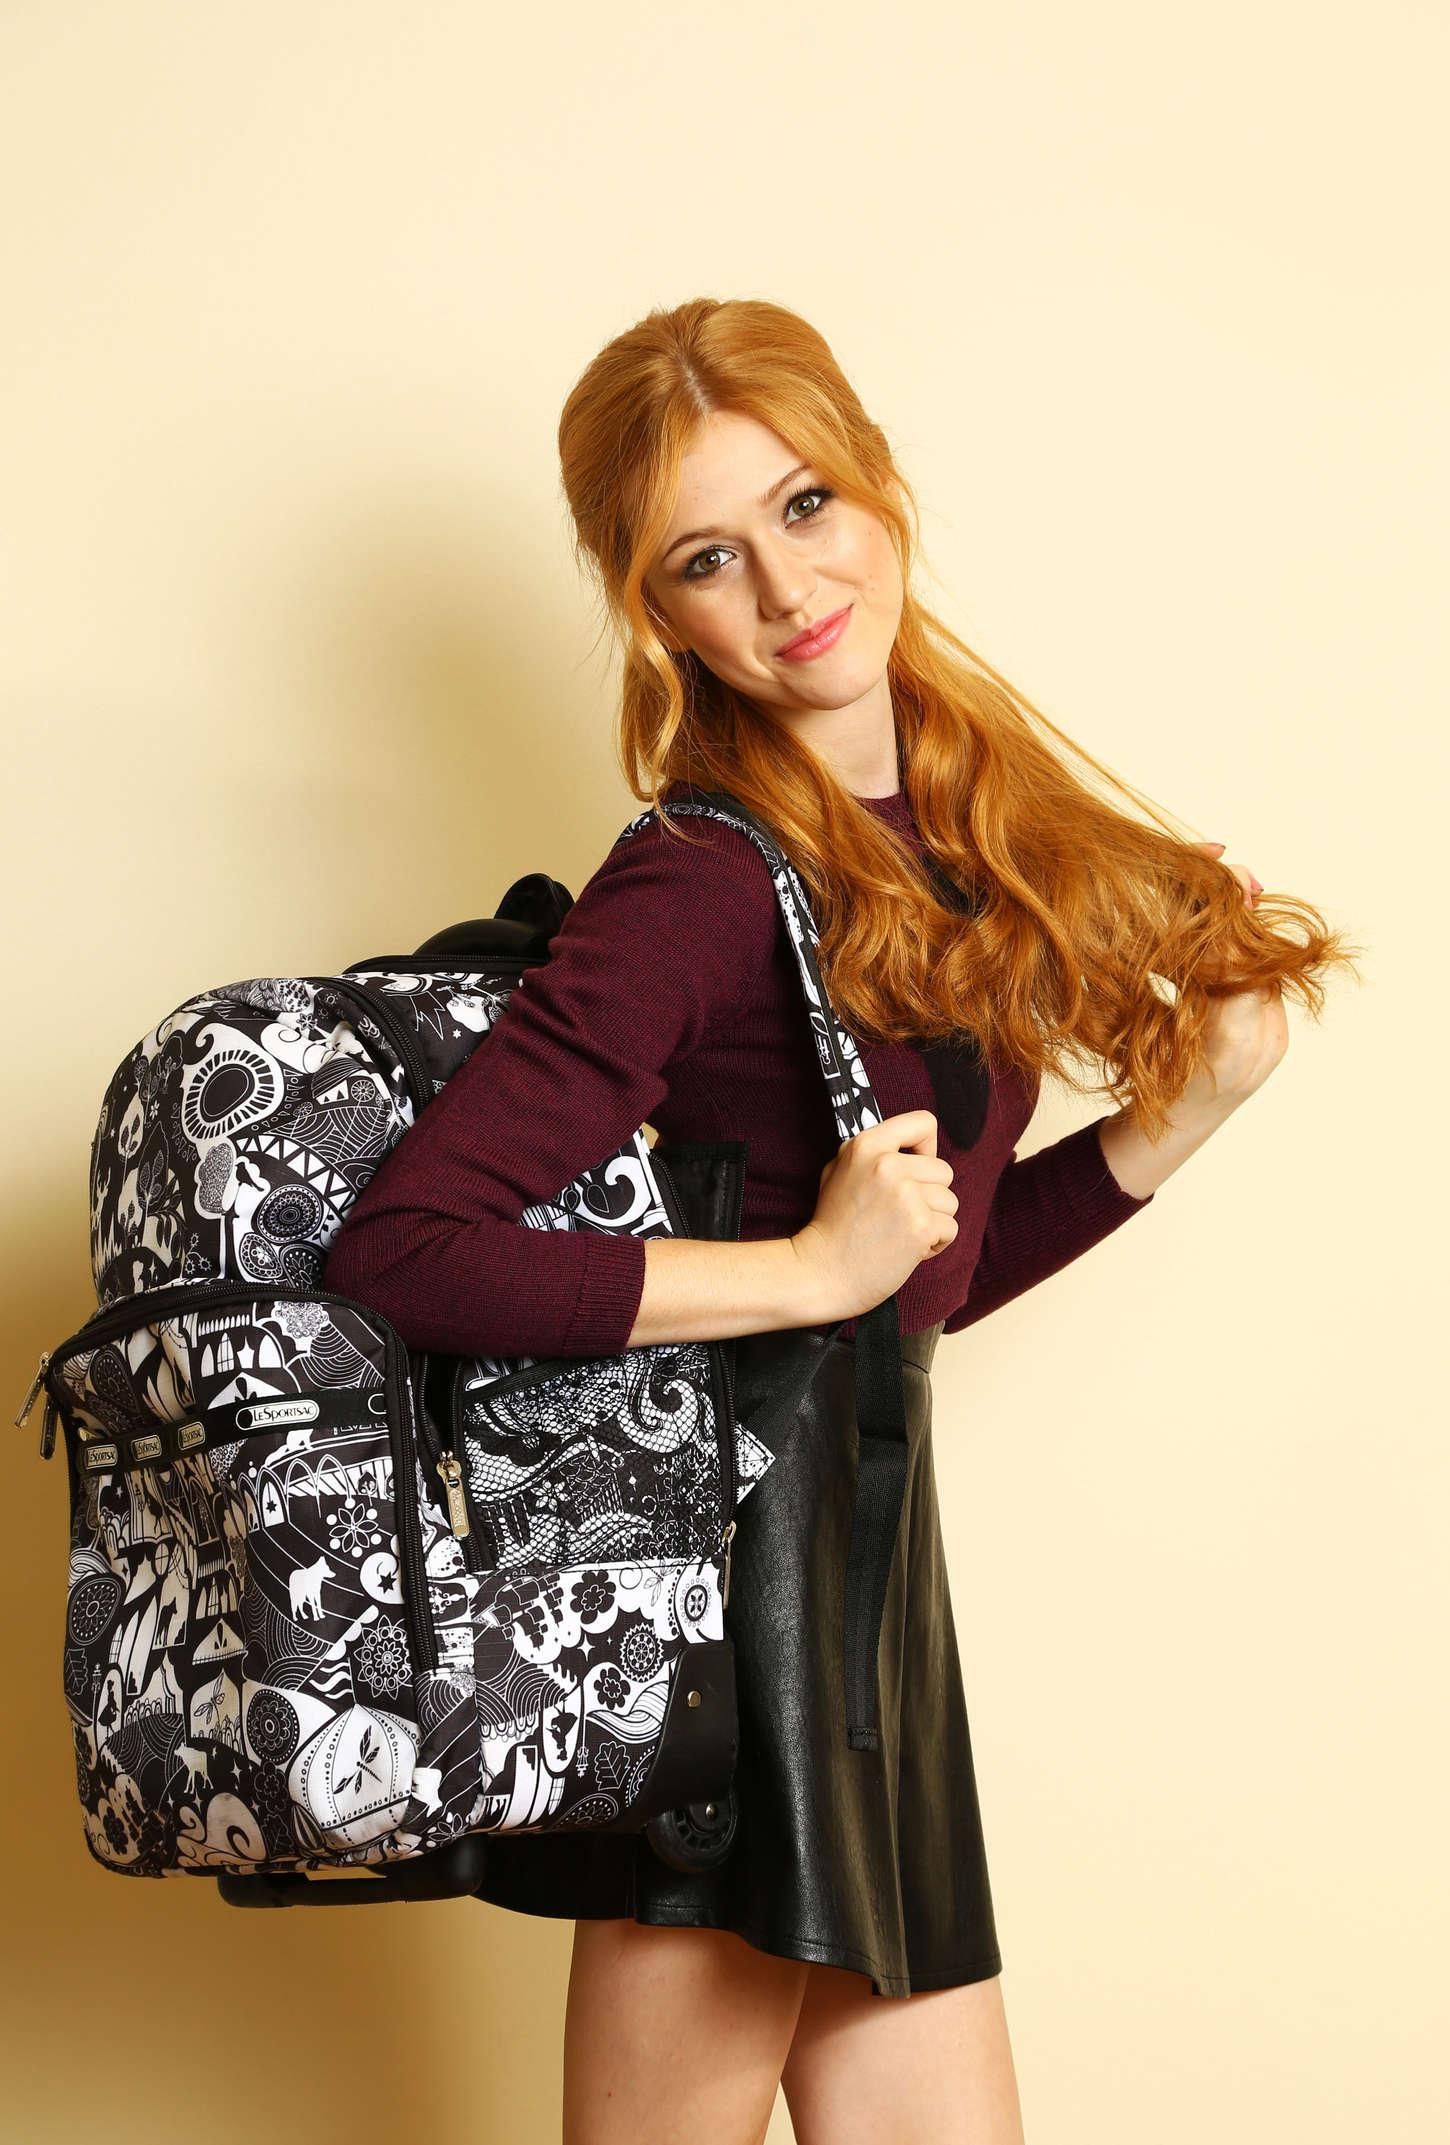 Katherine Mcnamara By Sara Jaye Weiss Back To School Shoot